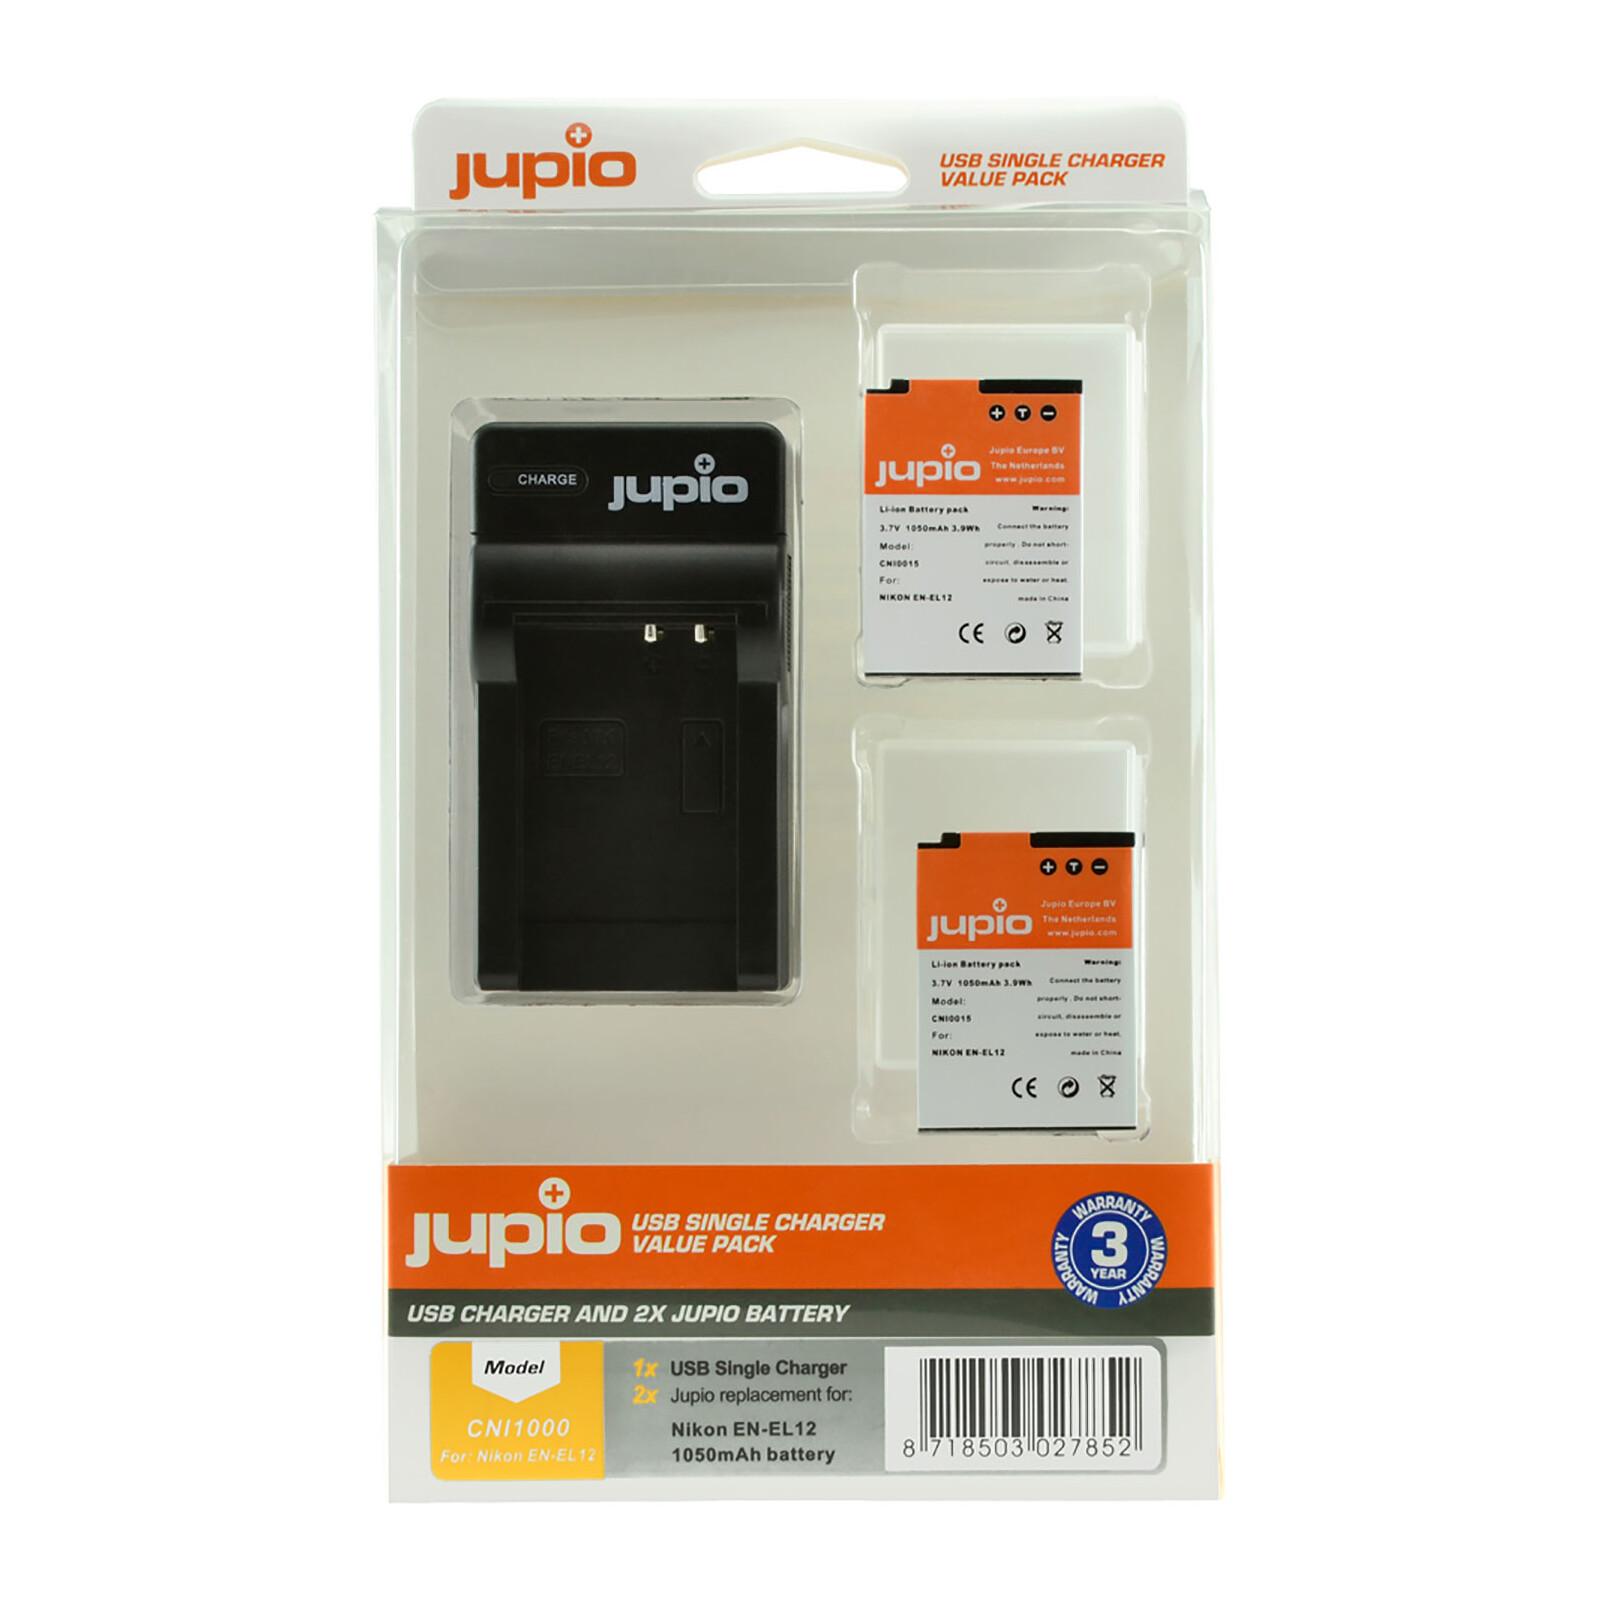 Jupio USB Single Charger + 2x Nik EN-EL12